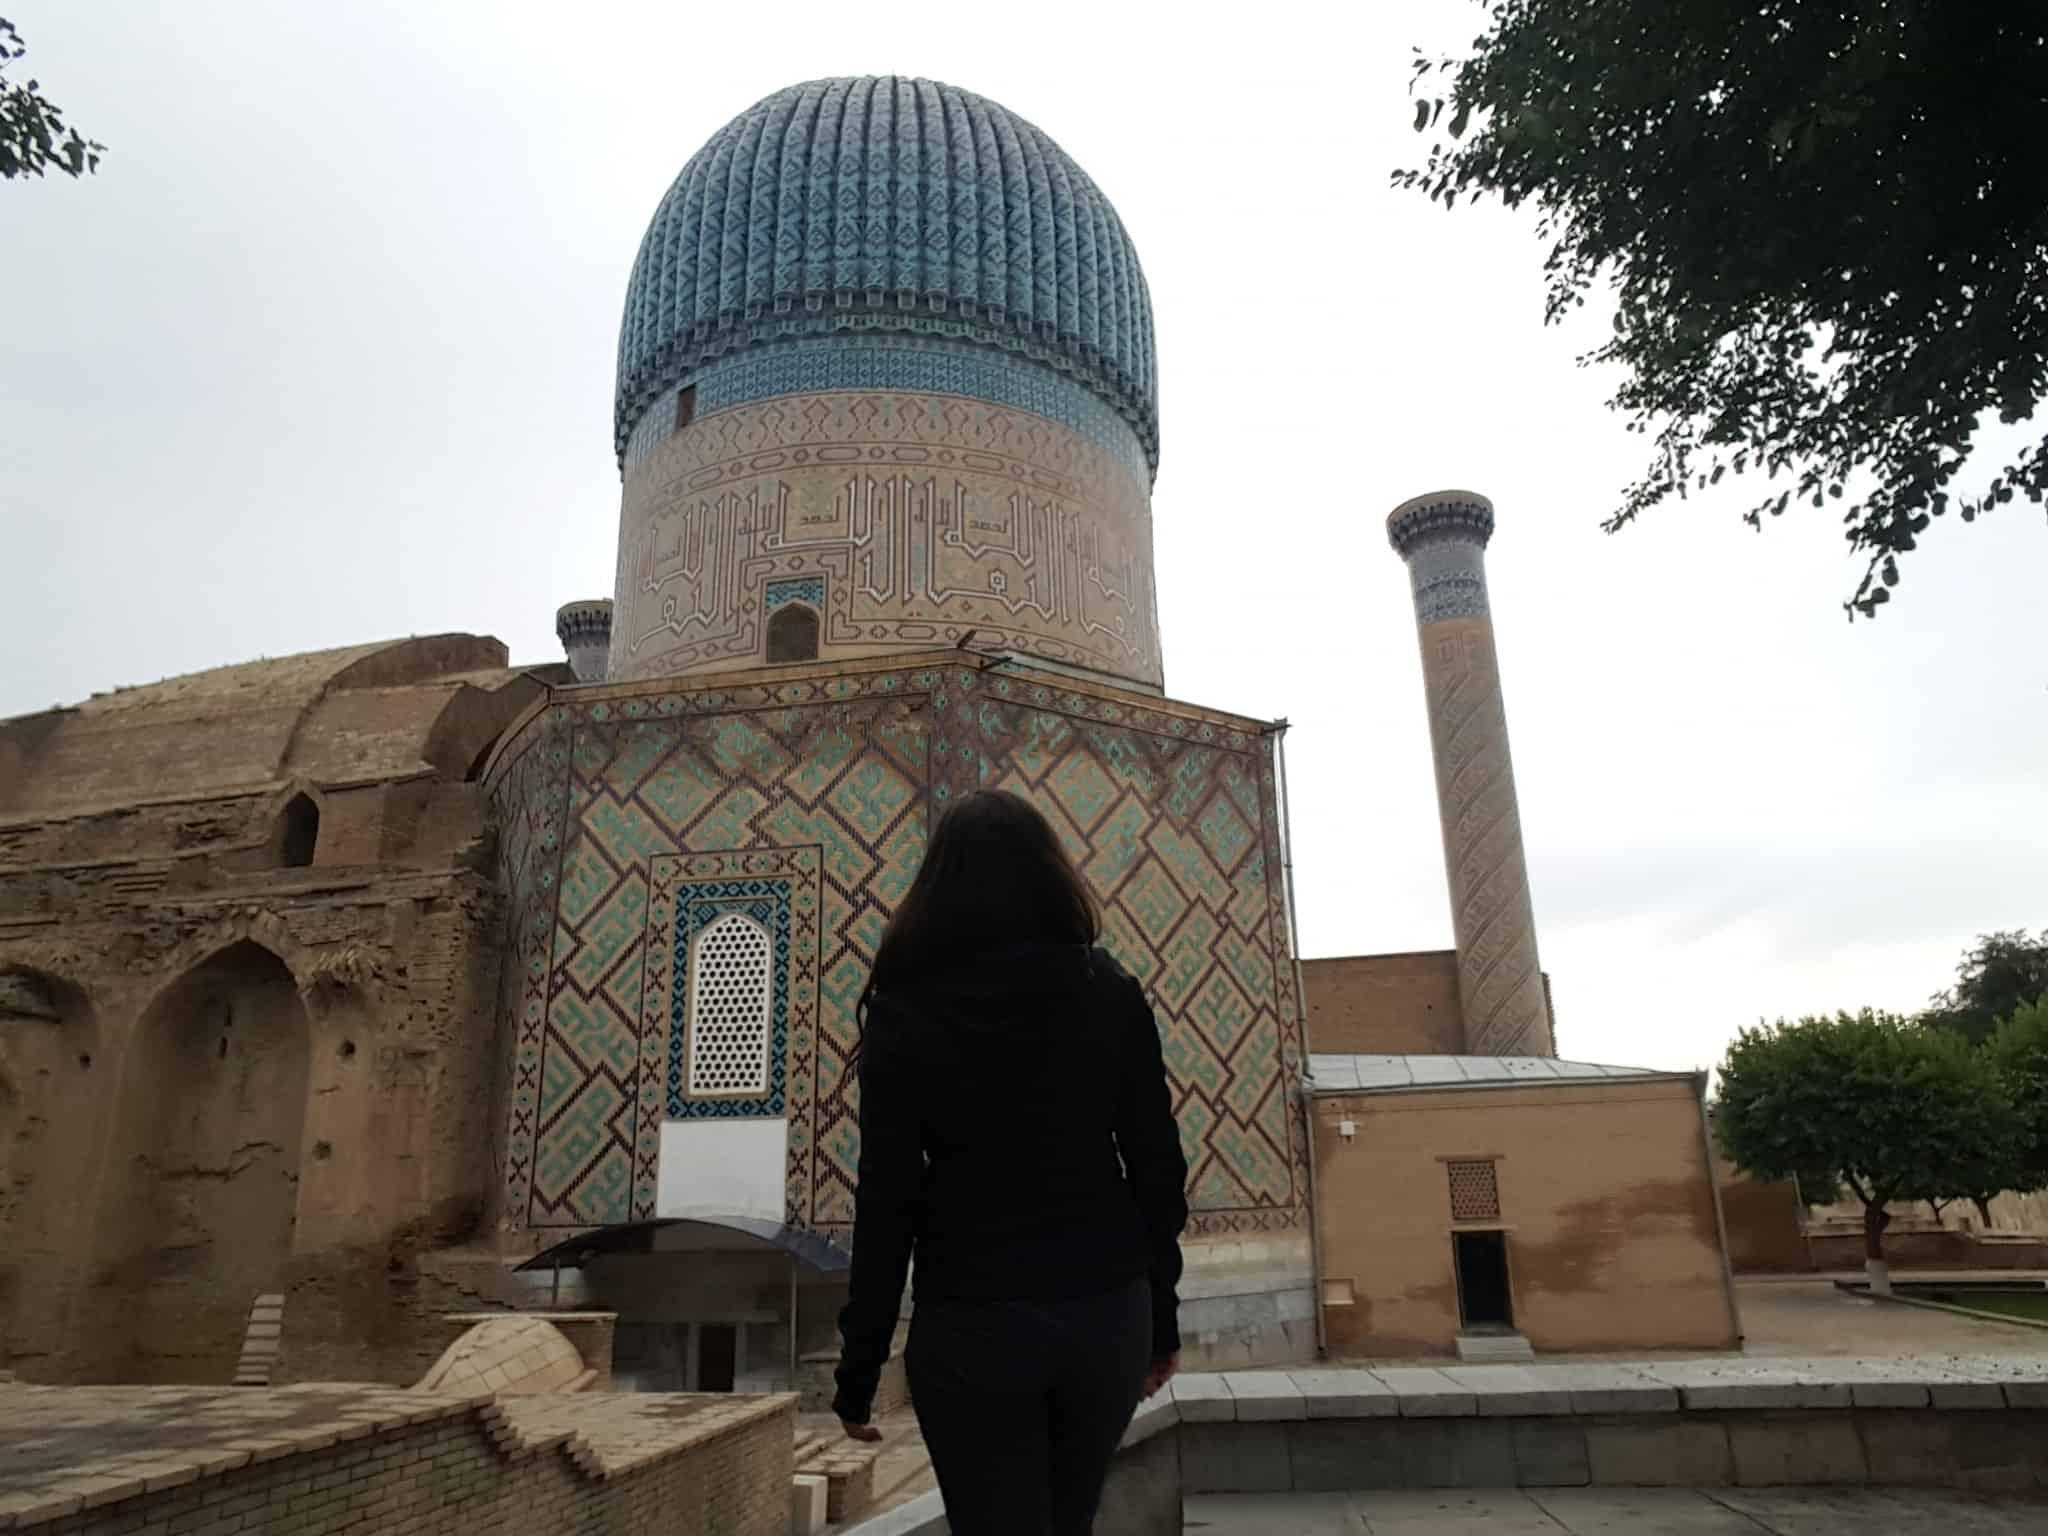 Uzbekistan itinerary: Gur-e-Amir